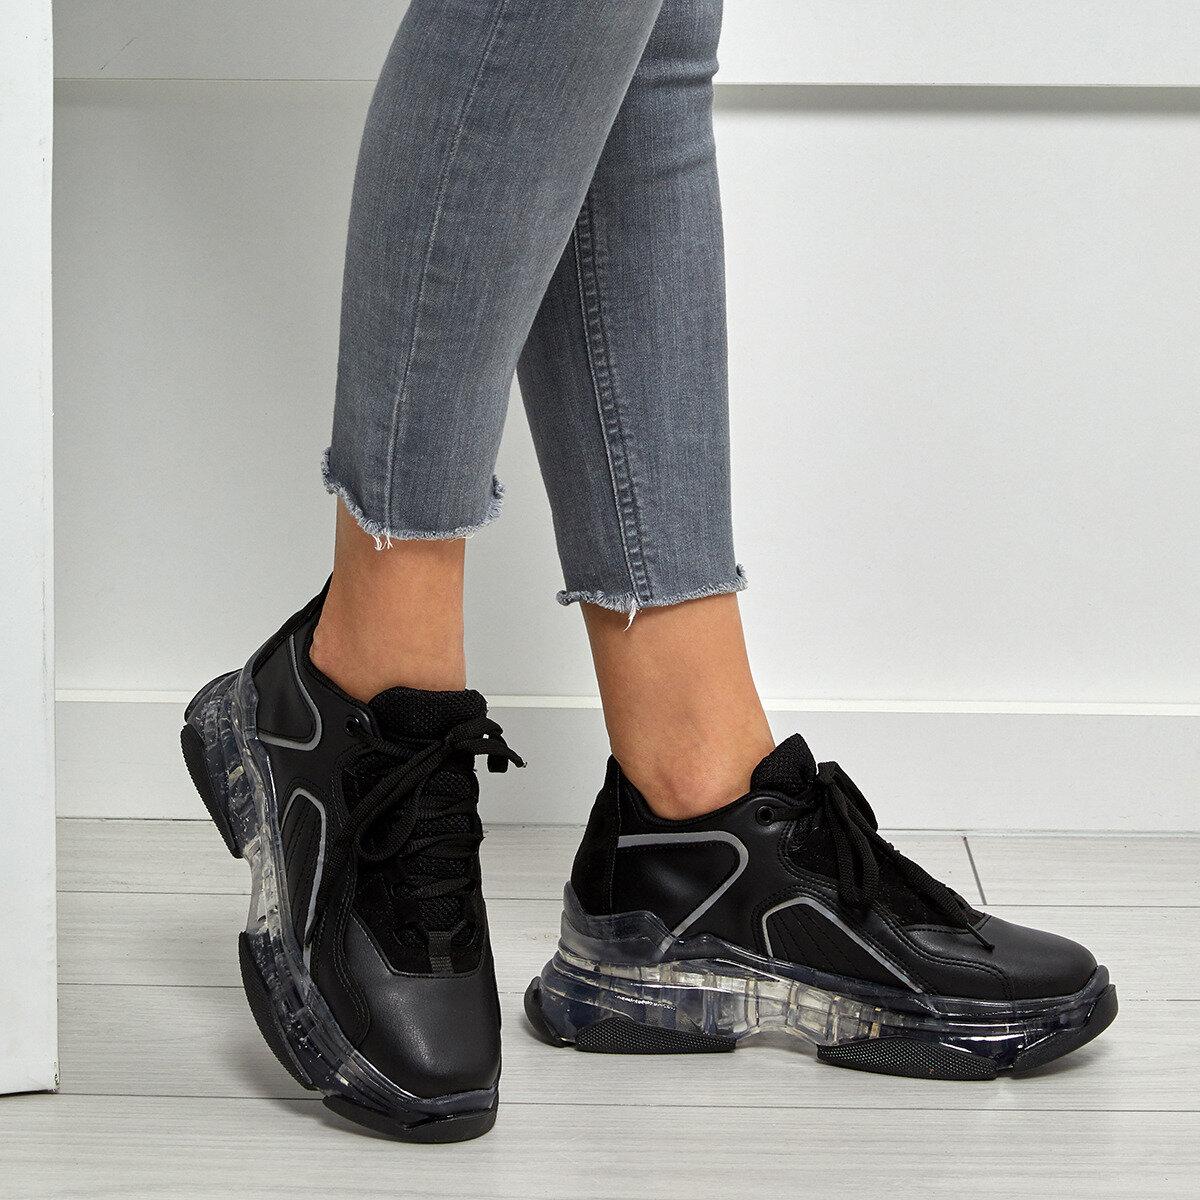 FLO Women Sneaker Women Transparent Casual Shoes Fashion Women Sneakers Breathable Walking Shoes Lace Up Flat Shoes BUTIGO VALESSA